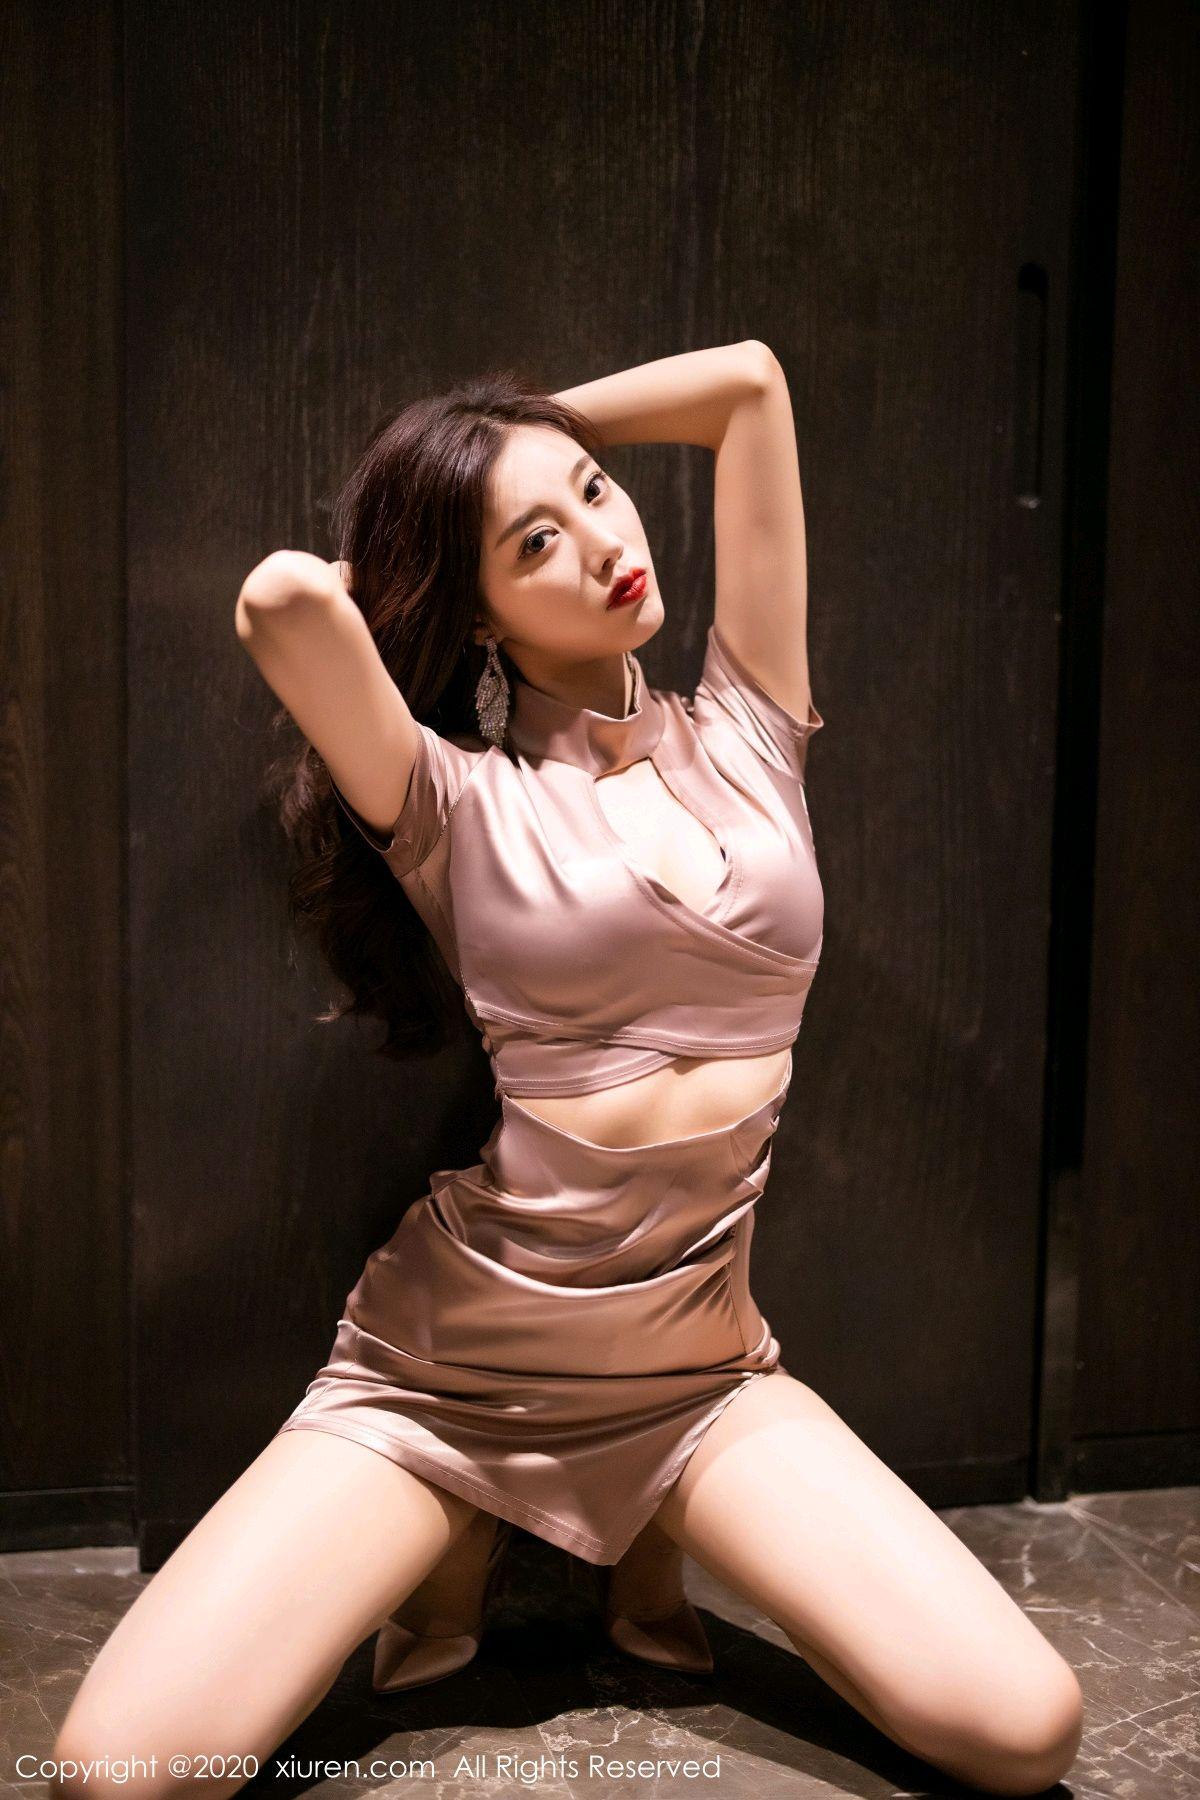 [XiuRen] Vol.2587 Yang Chen Chen 38P, Underwear, Xiuren, Yang Chen Chen